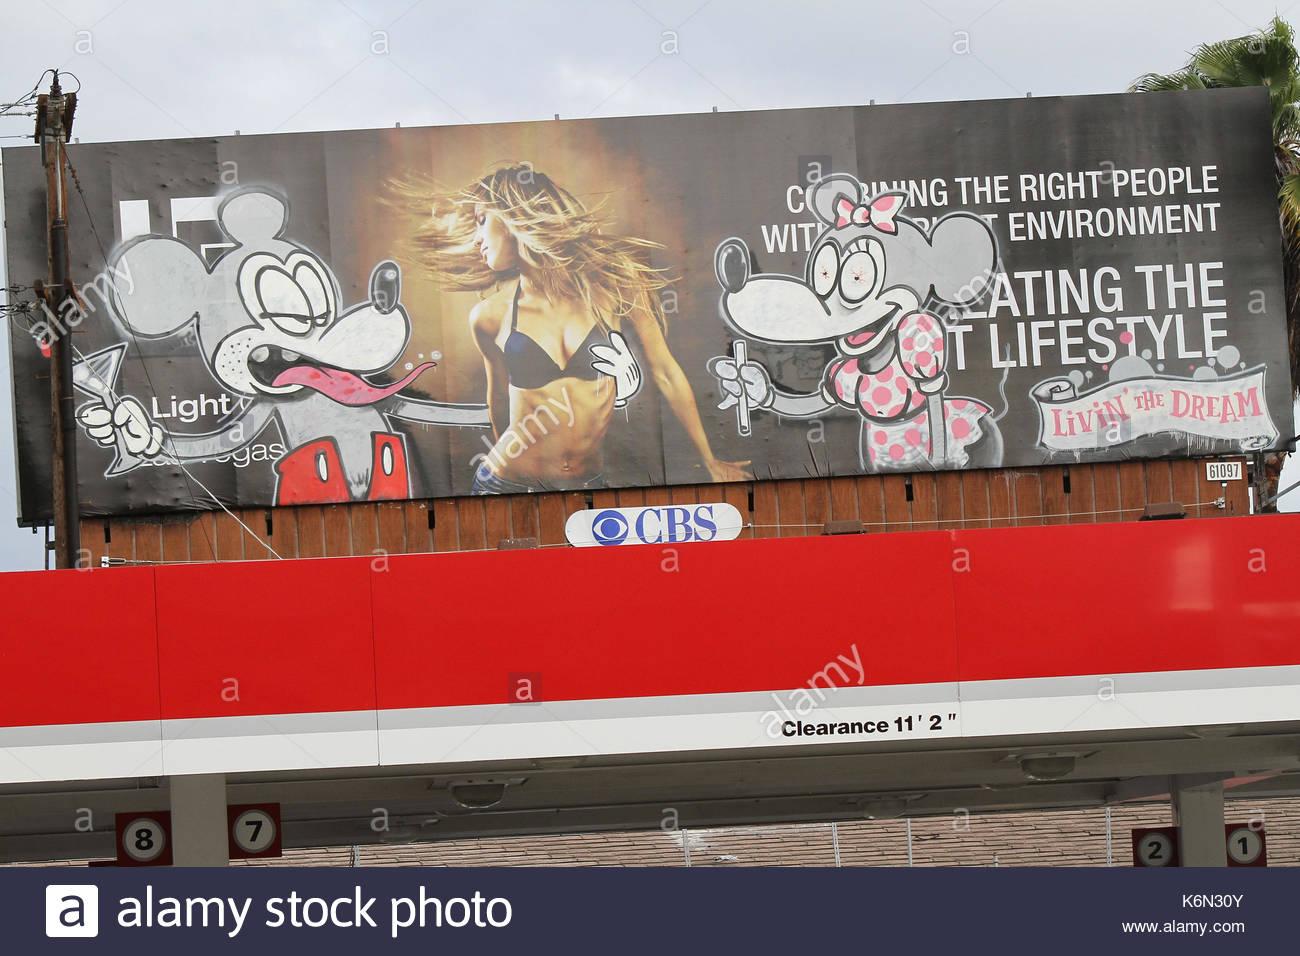 Banksy graffiti. Oscar nominada artista de graffiti banksy ...